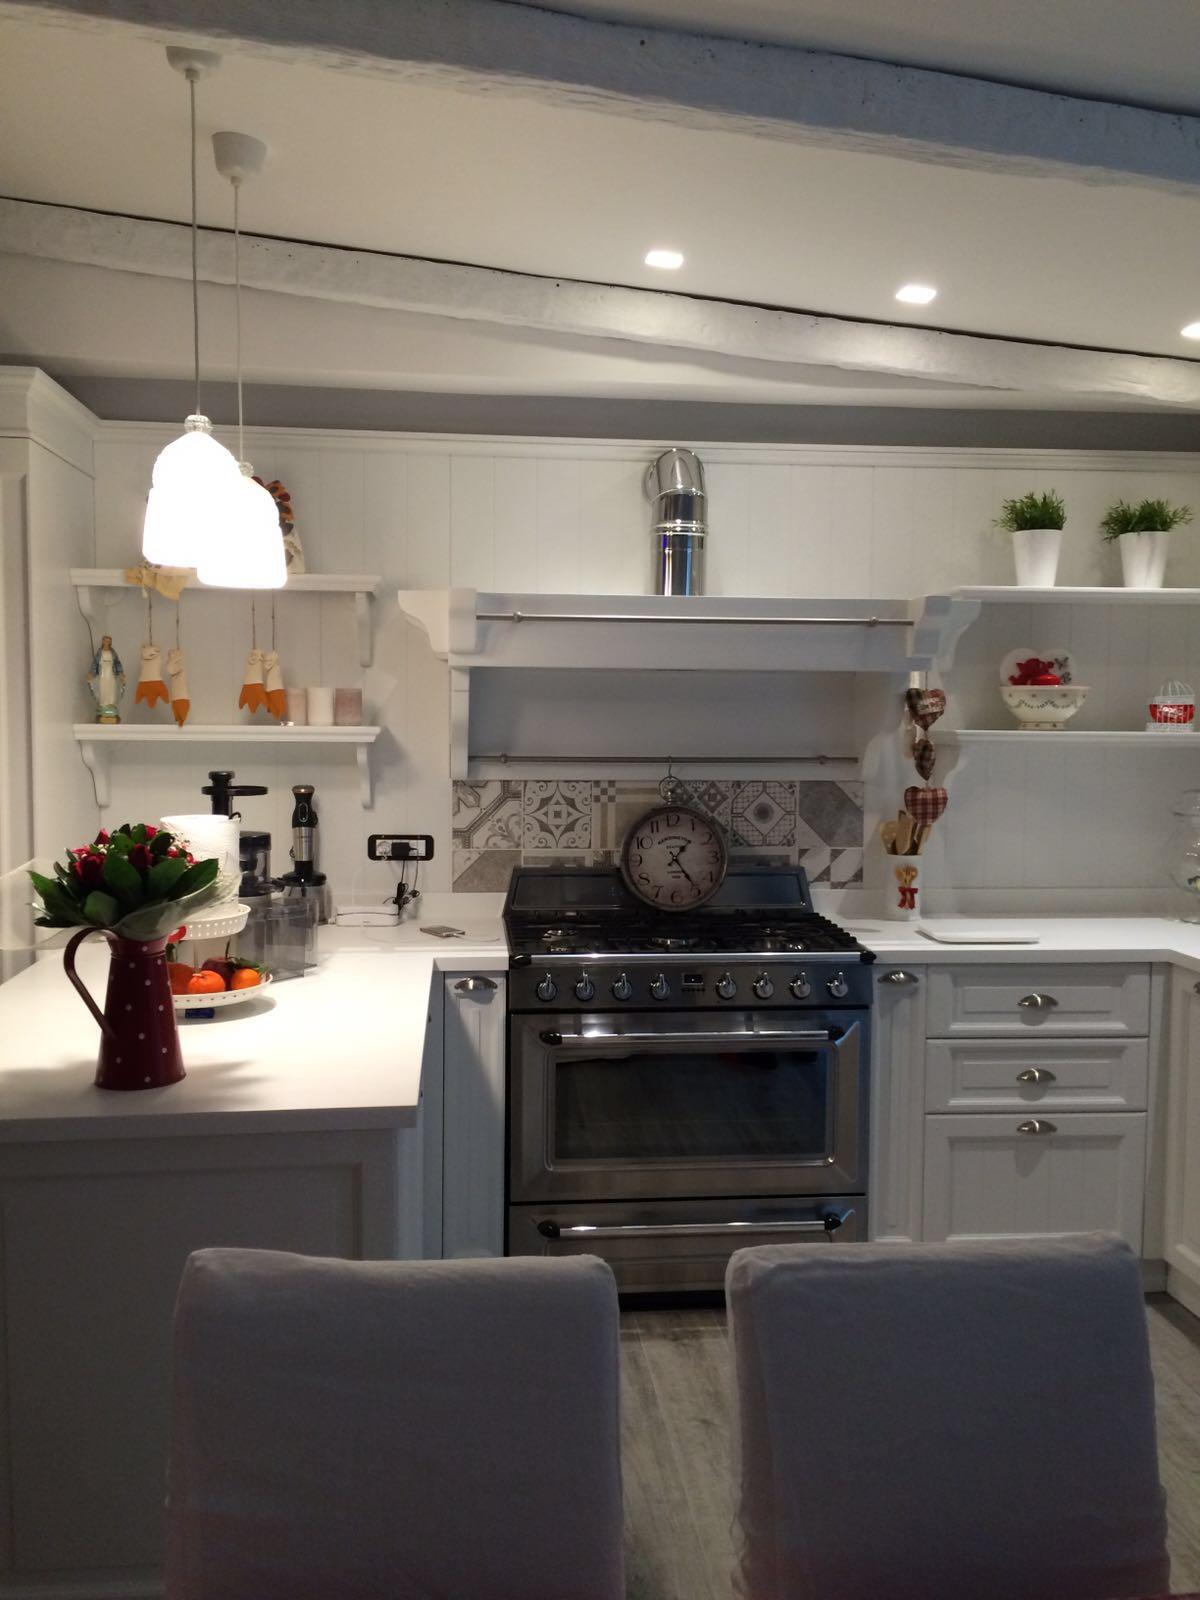 Cucina top corian - Top cucina corian prezzi ...